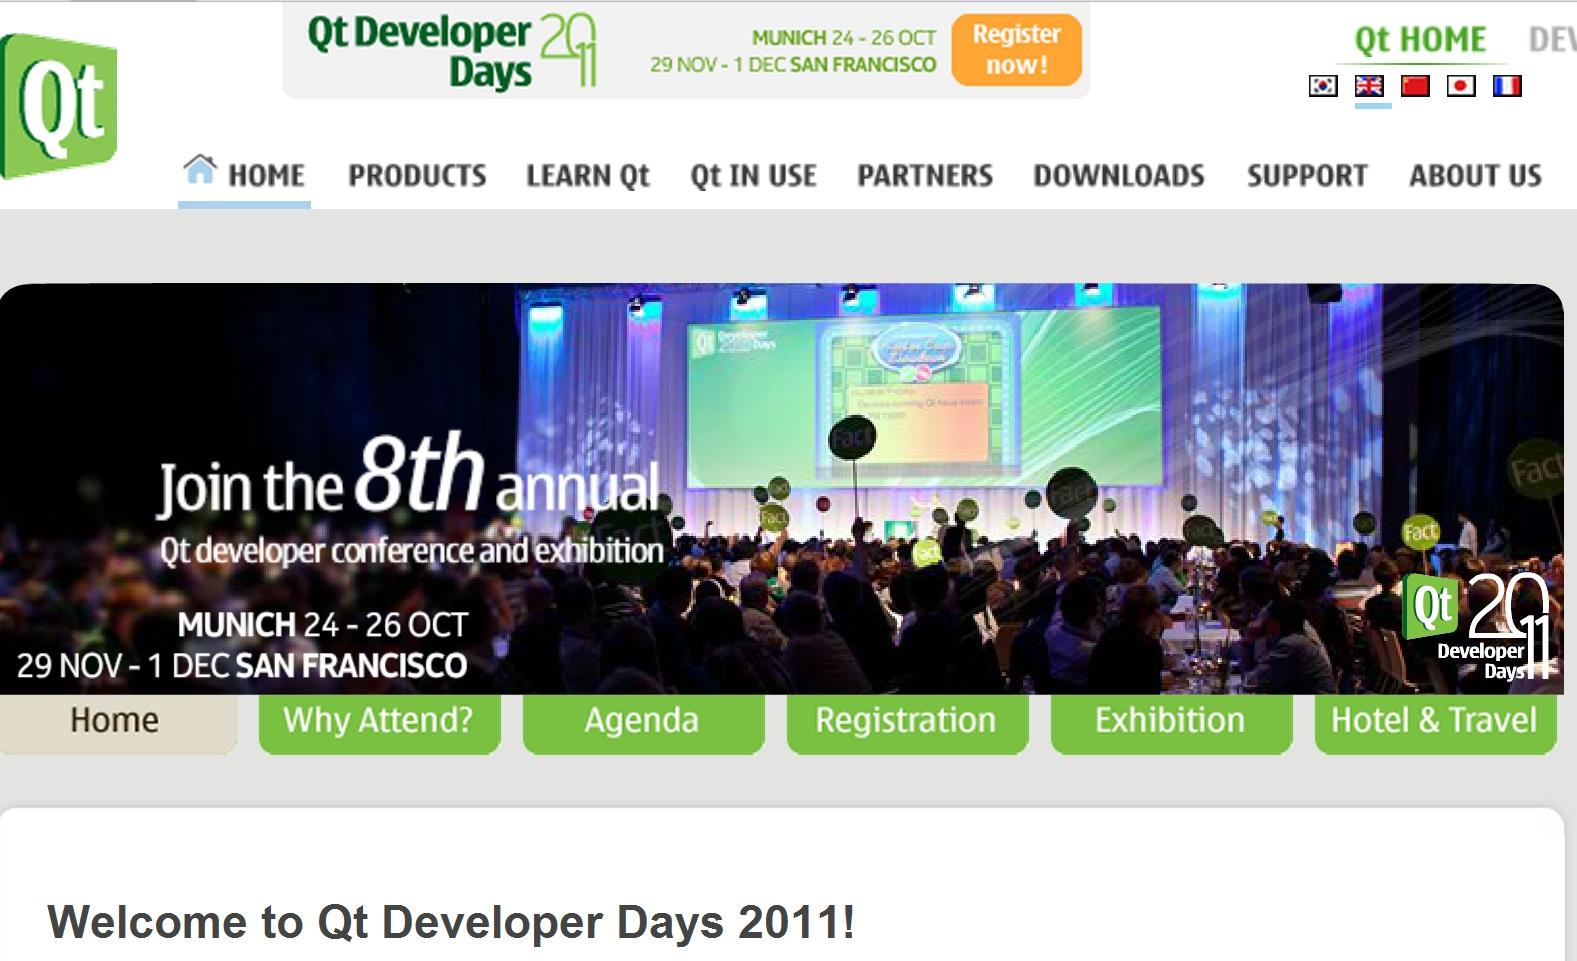 Qt Developer Day begins! (24th – 26th October) : My Nokia